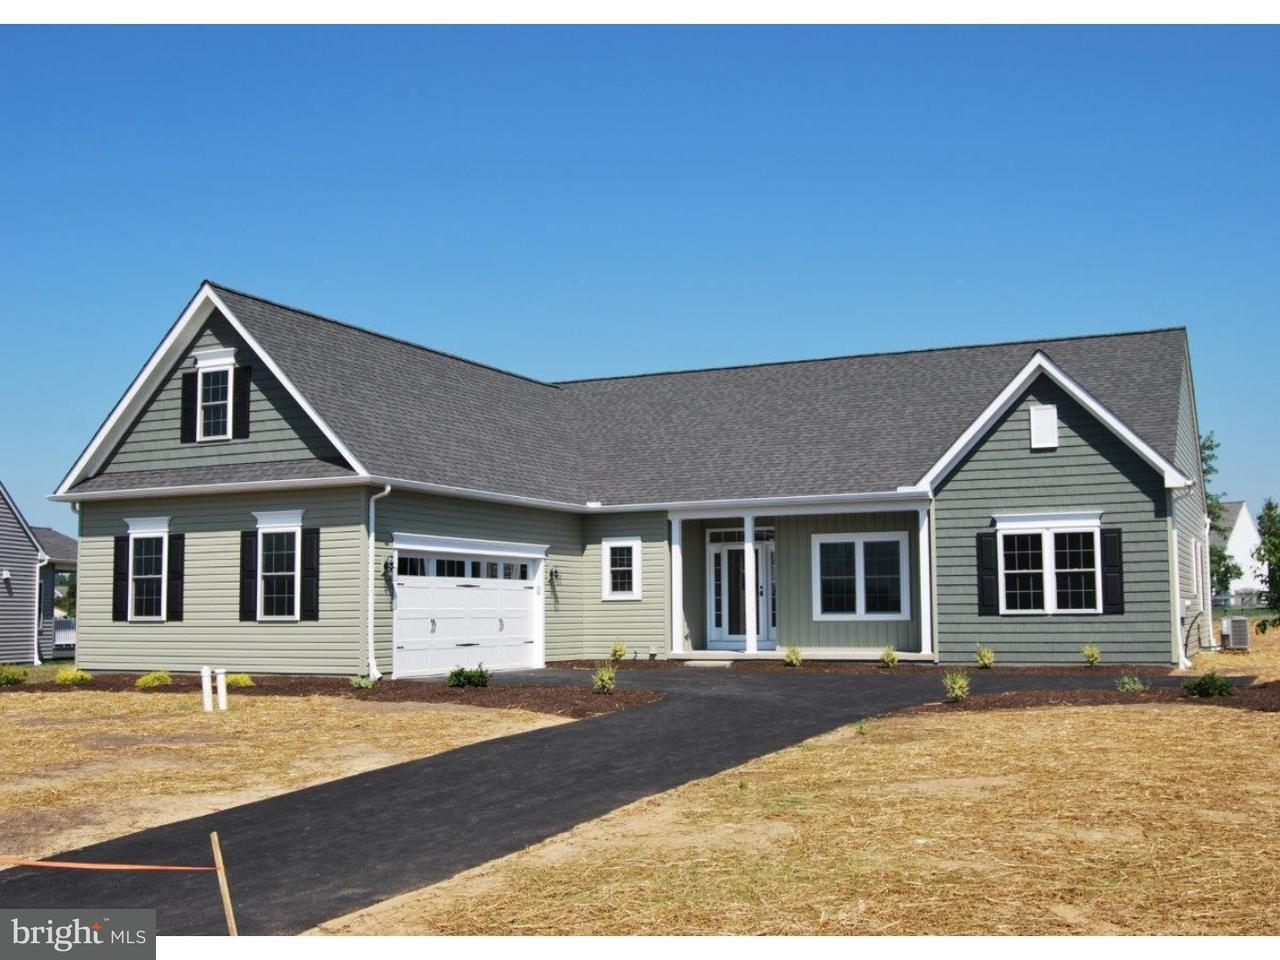 Single Family Home for Sale at 634 WILLOW Lane Atglen, Pennsylvania 19310 United States